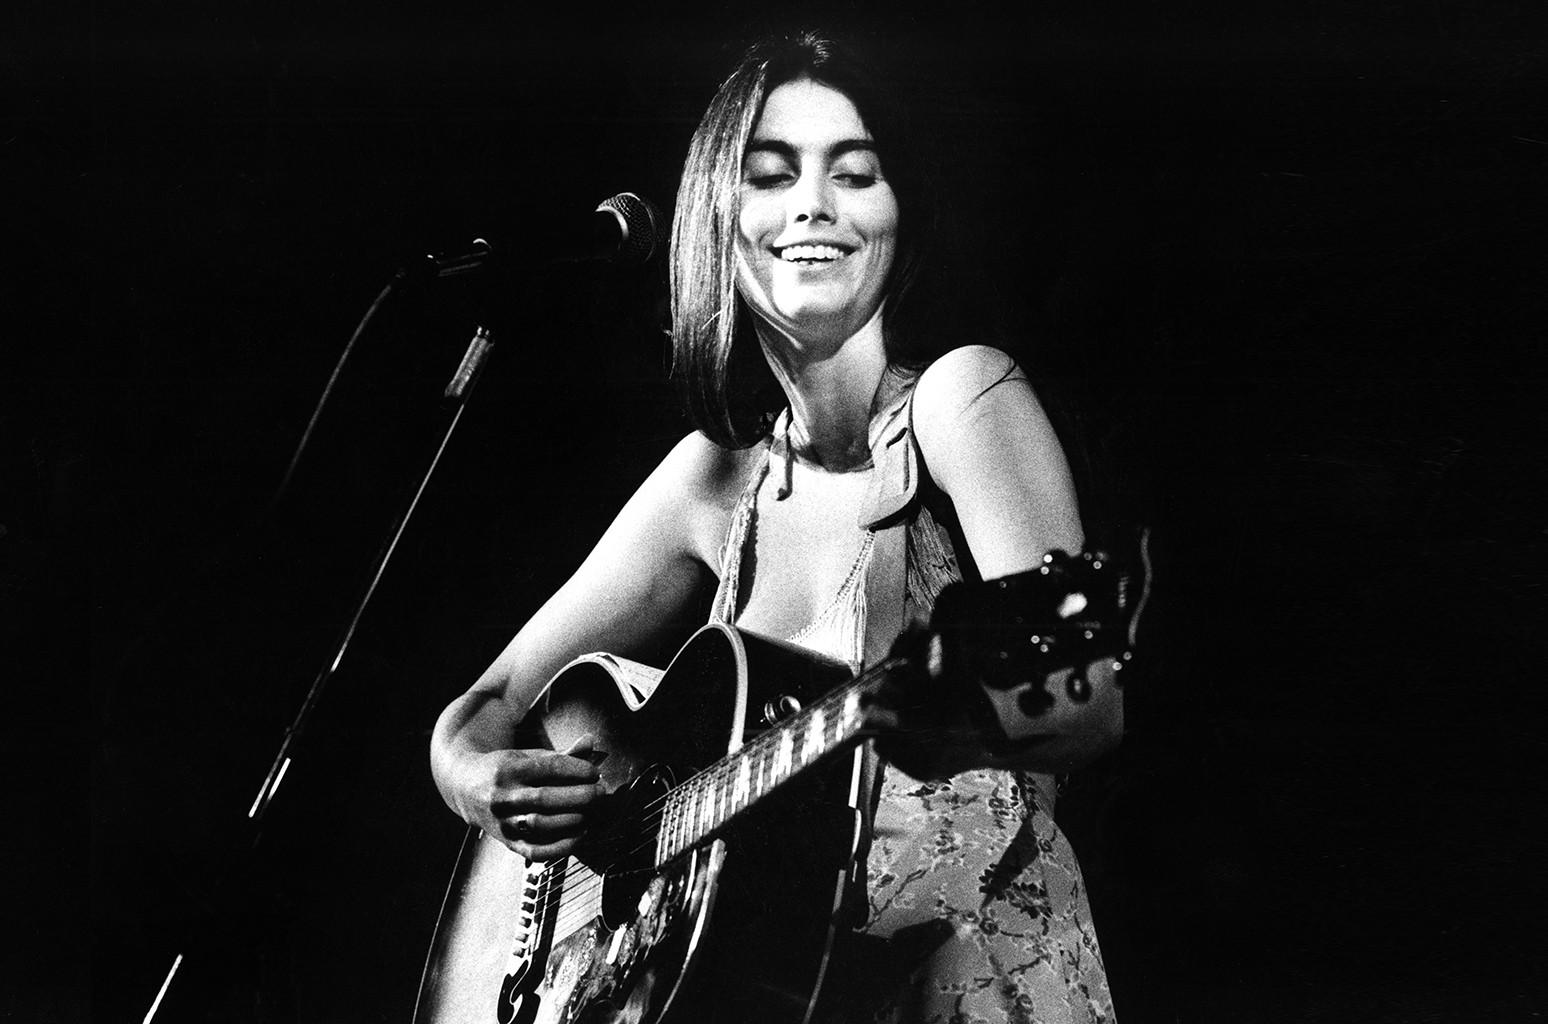 Emmylou Harris performs live in Nijmegen, Netherlands in 1976 (Photo by Gijsbert Hanekroot/Redferns)